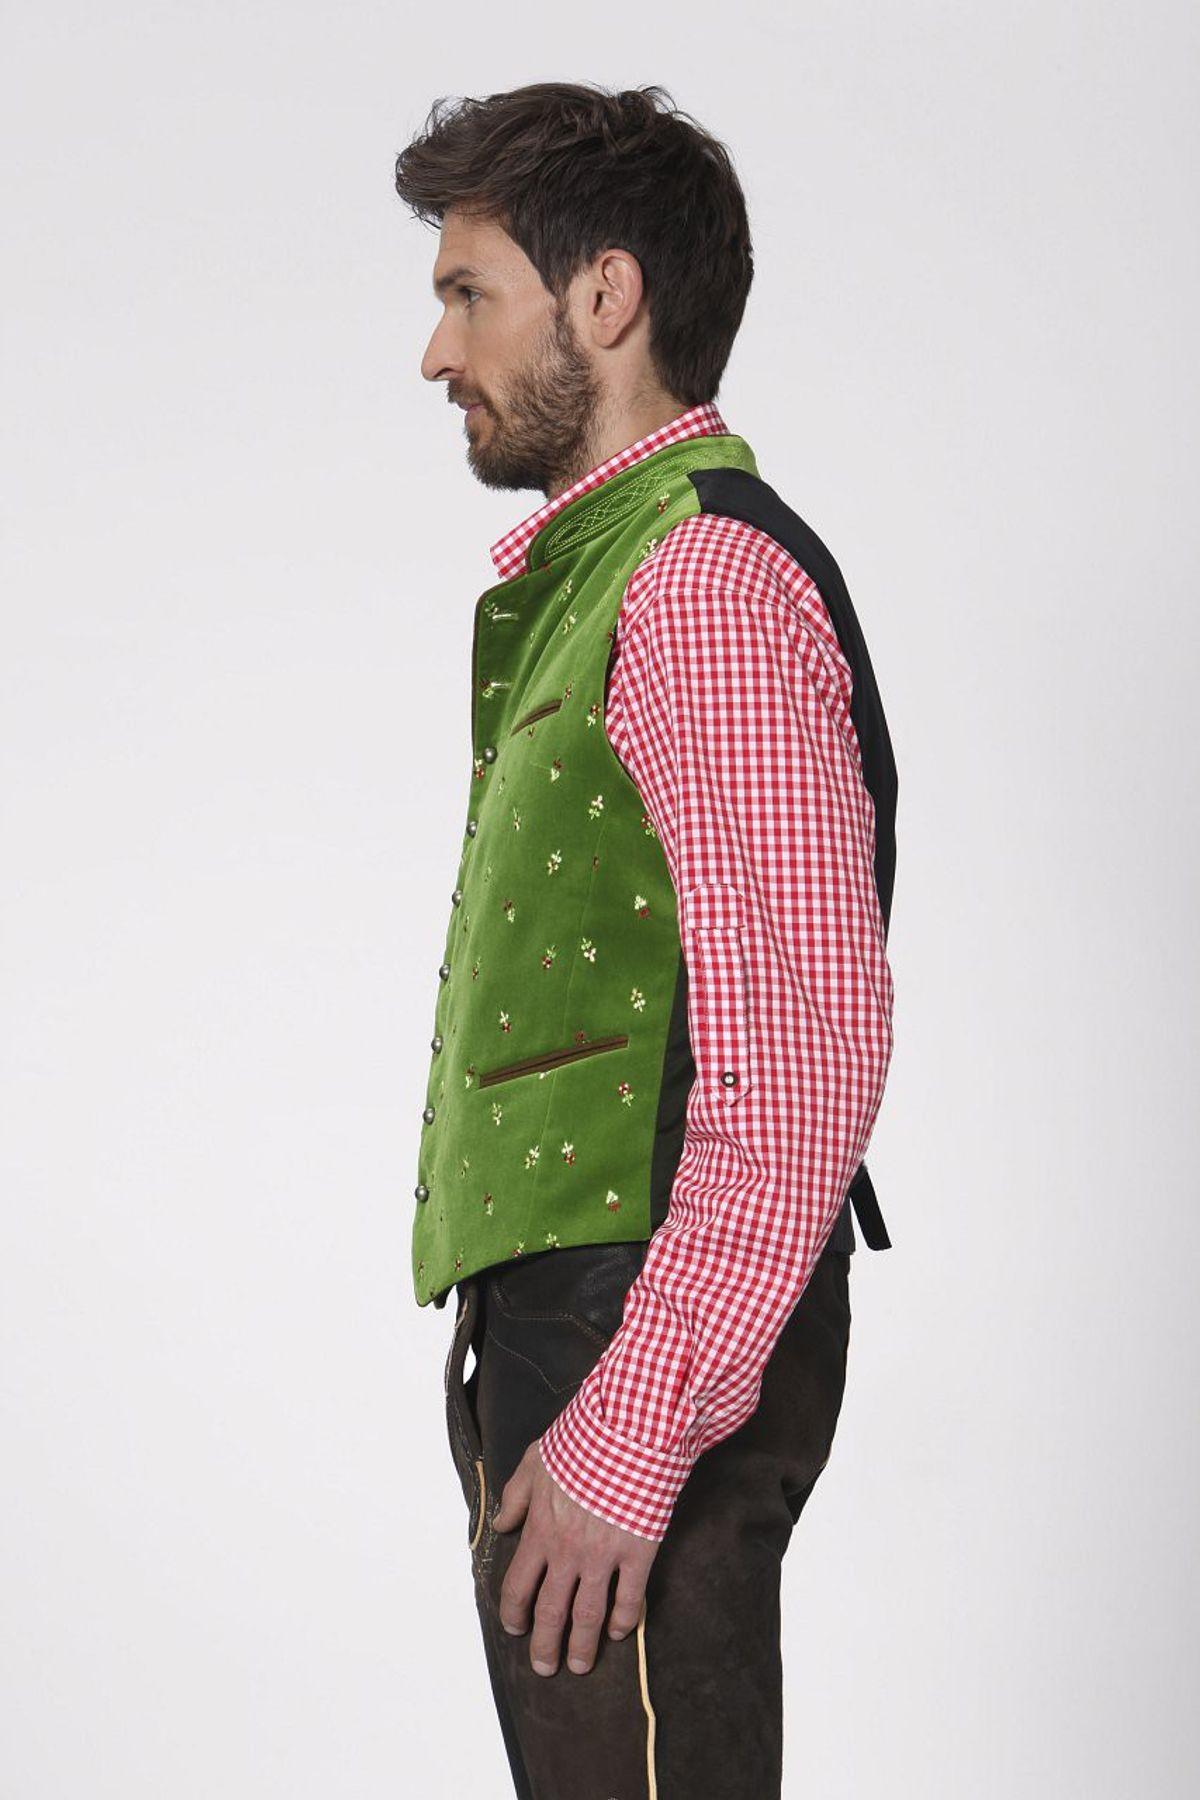 Stockerpoint - Herren Trachten Weste in verschiedenen Farbtönen, Calzado – Bild 13